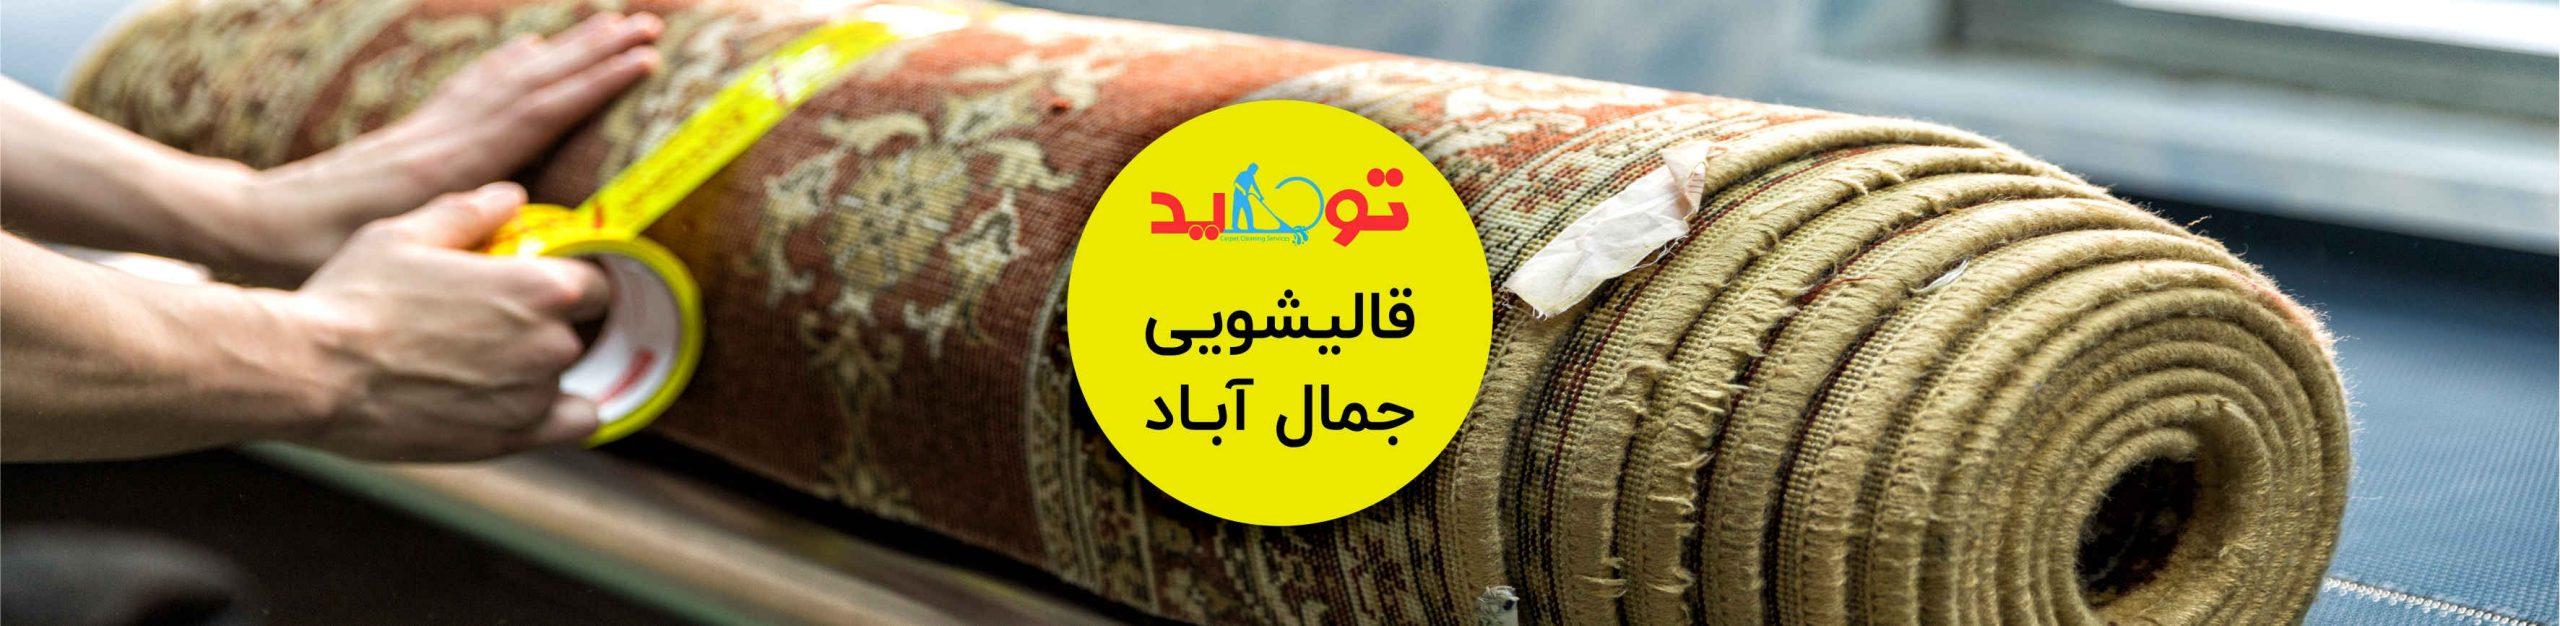 قالیشویی جمال آباد